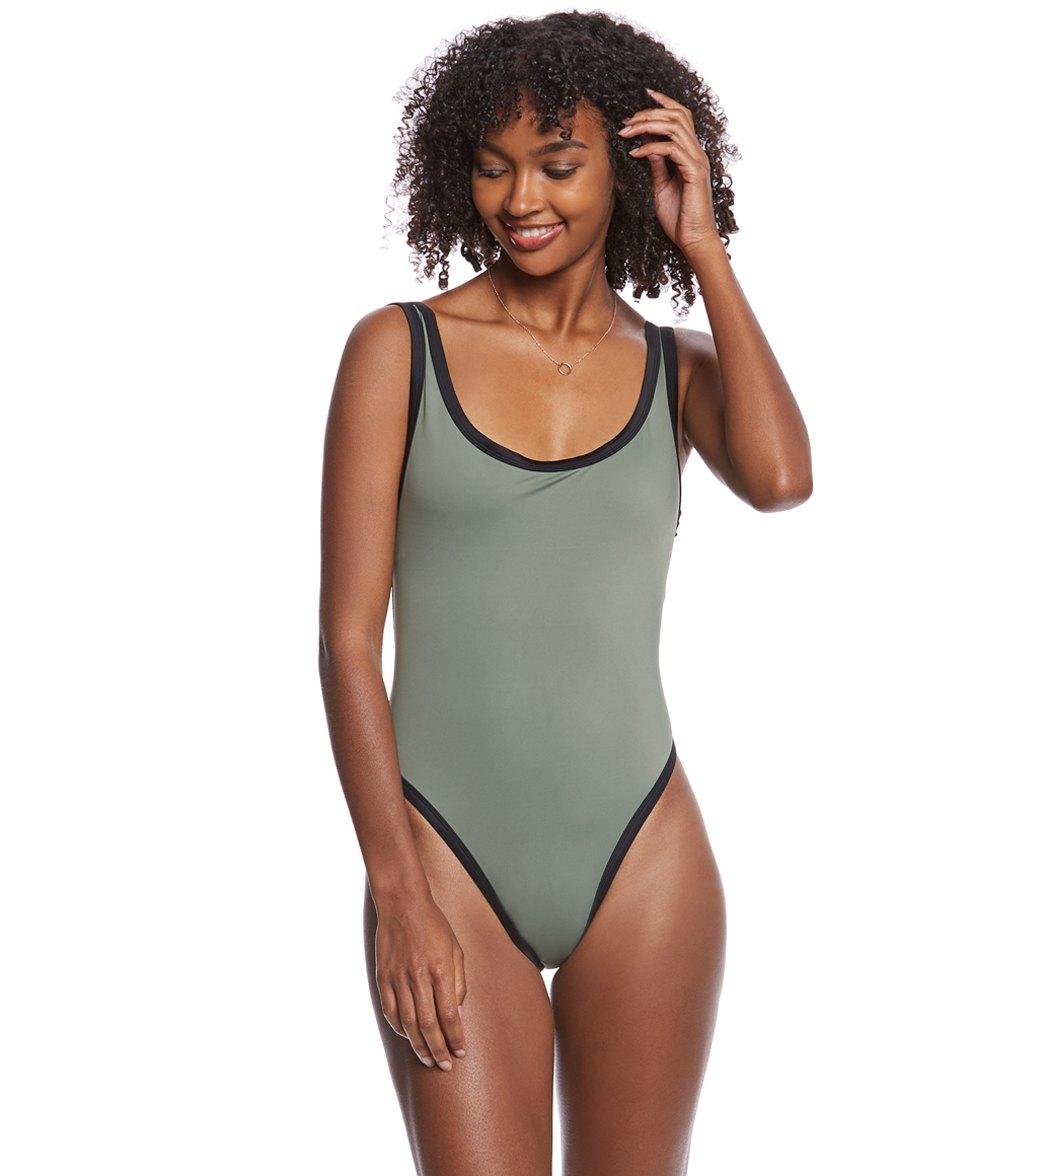 e8dd5ca7298 Body Glove Swimwear Seaway Rocky One Piece Swimsuit at SwimOutlet.com -  Free Shipping